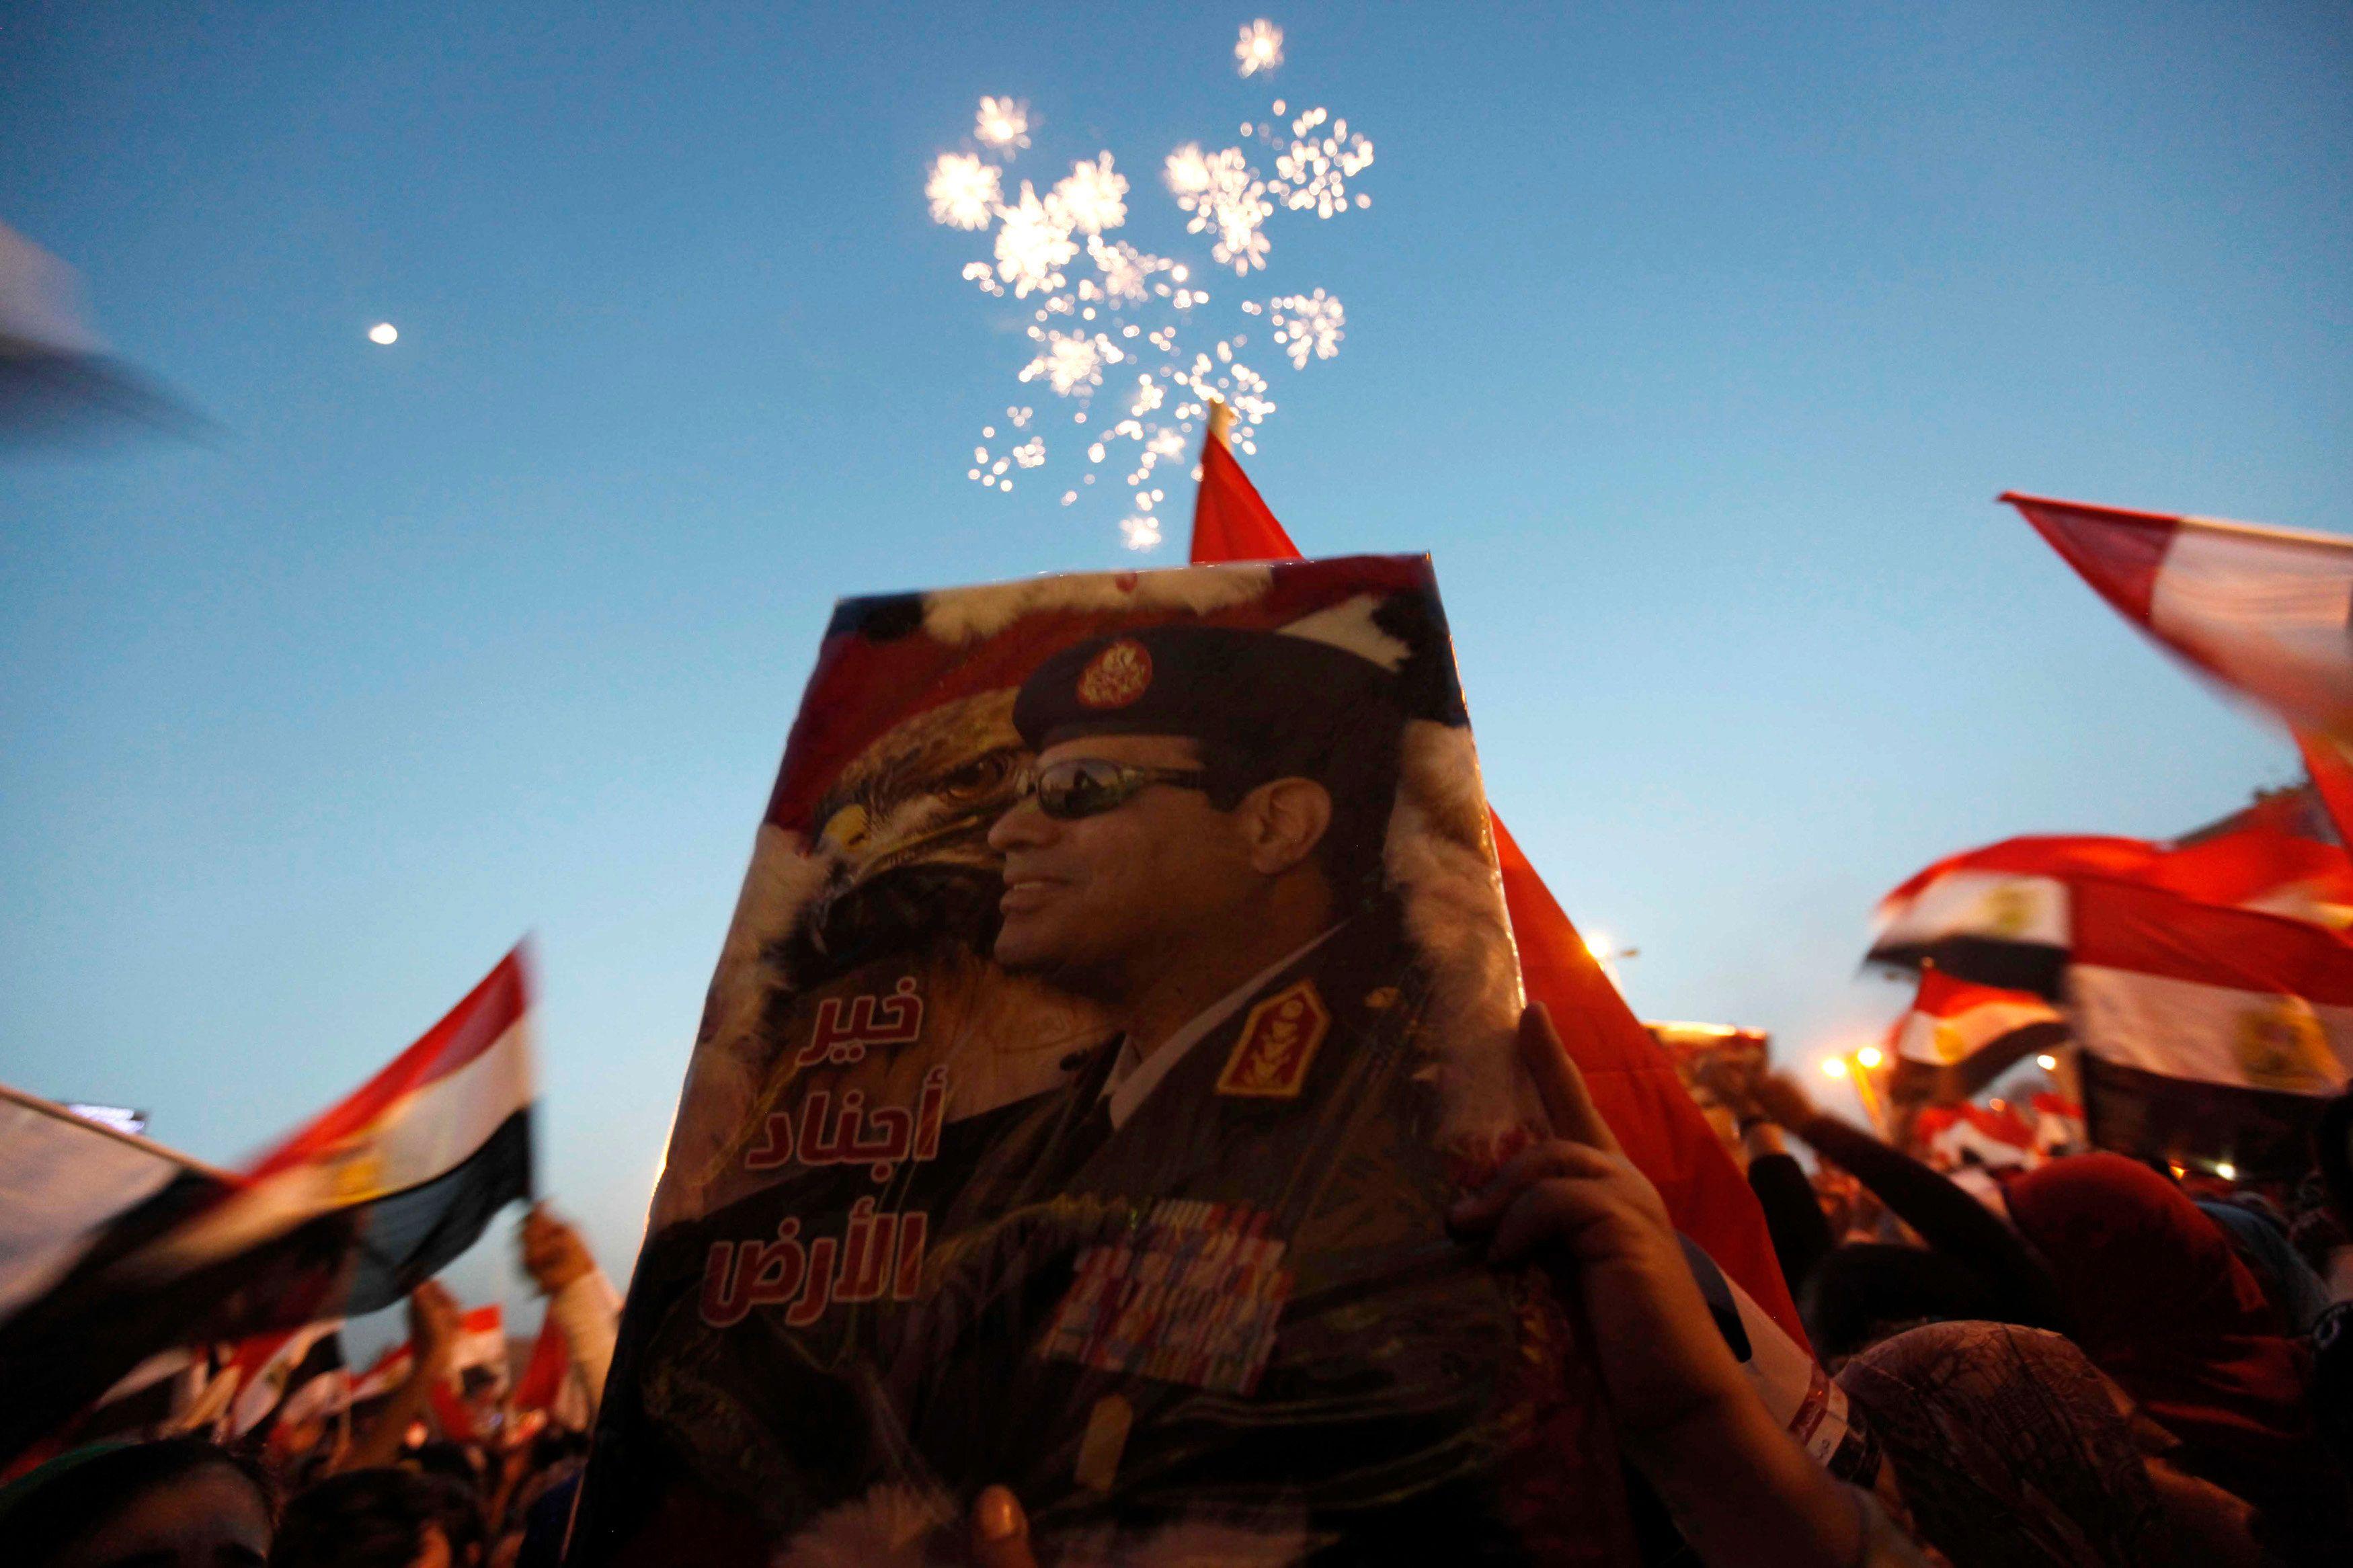 Hard Numbers: An American in Egypt dies on hunger strike